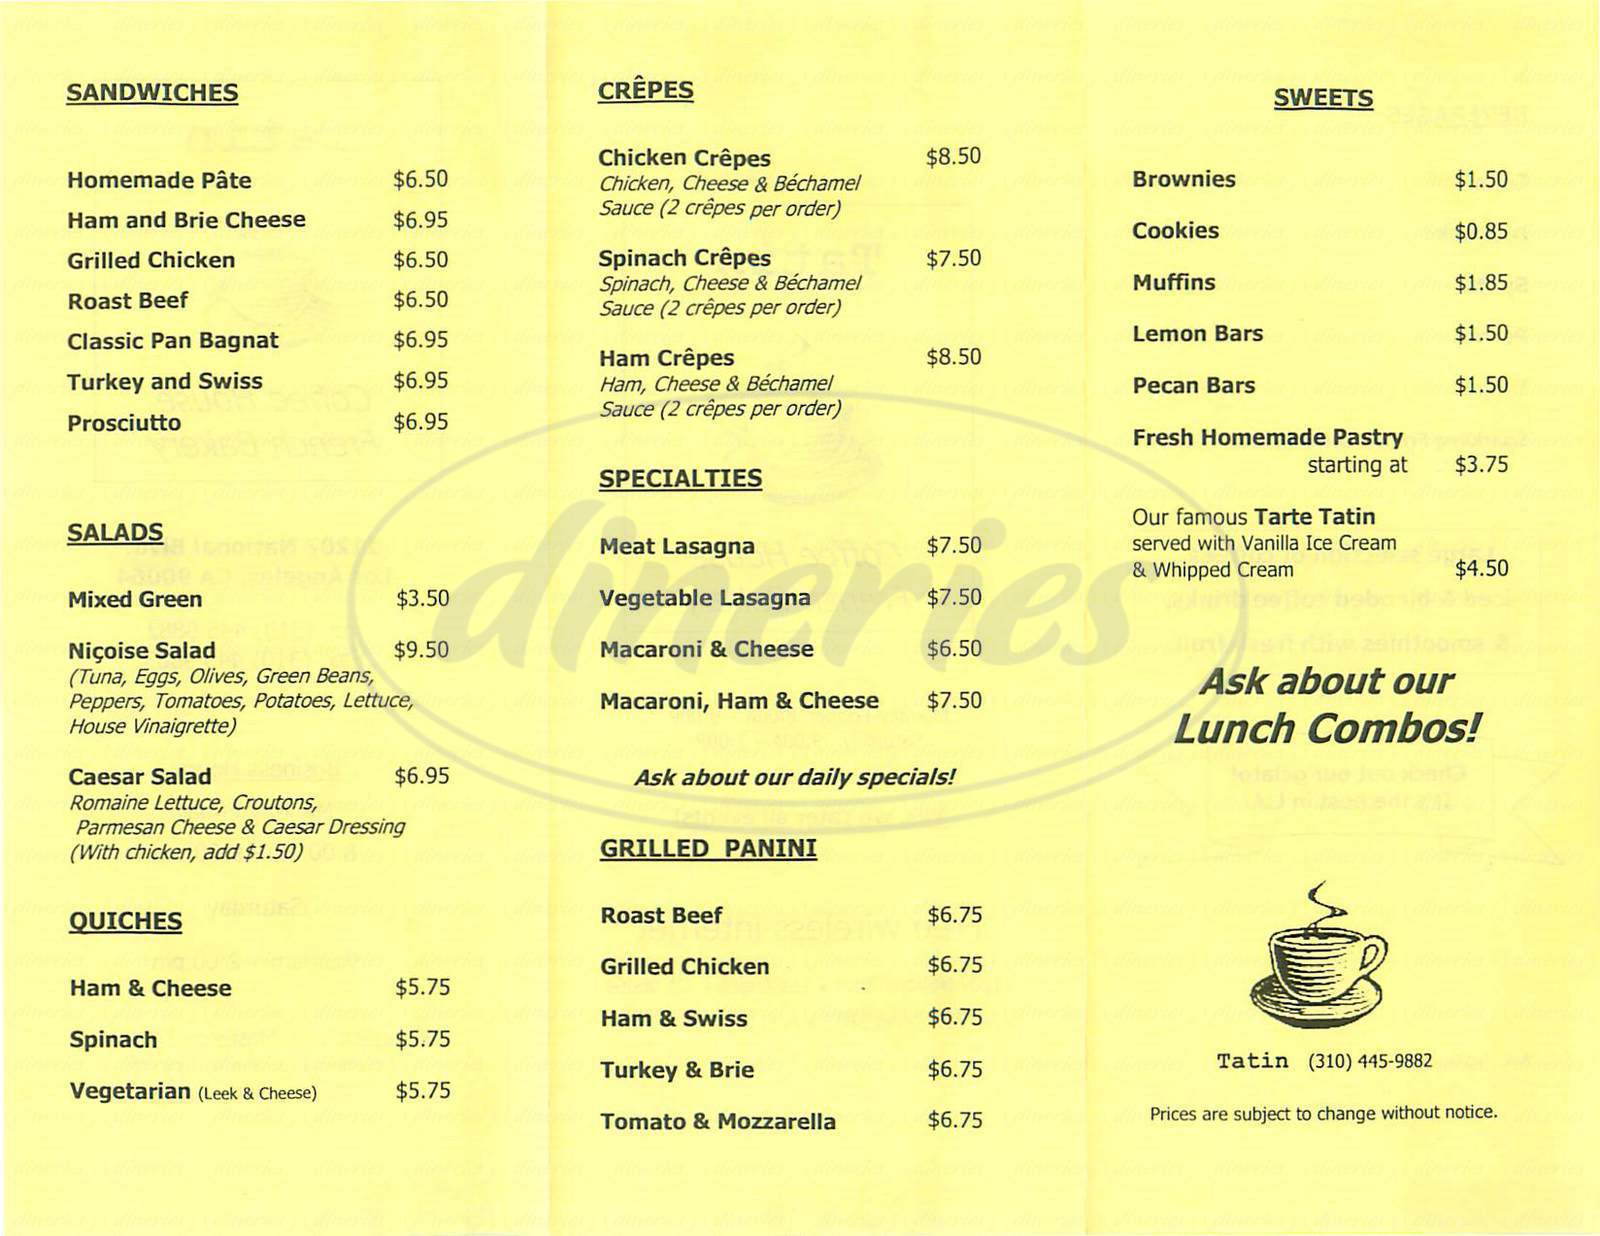 menu for Tatin Coffee House